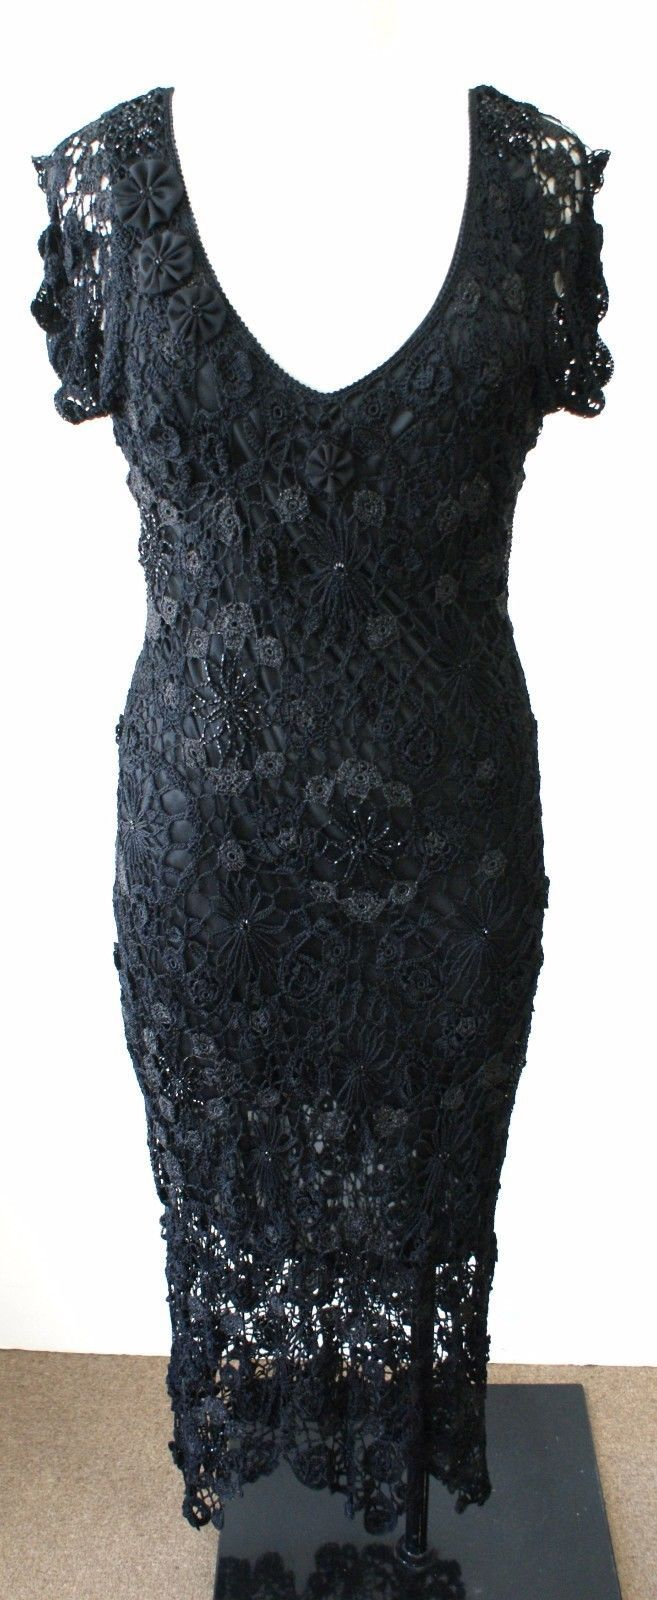 21484fe95a Ralph Lauren Black Label Black Crochet and 50 similar items. 57